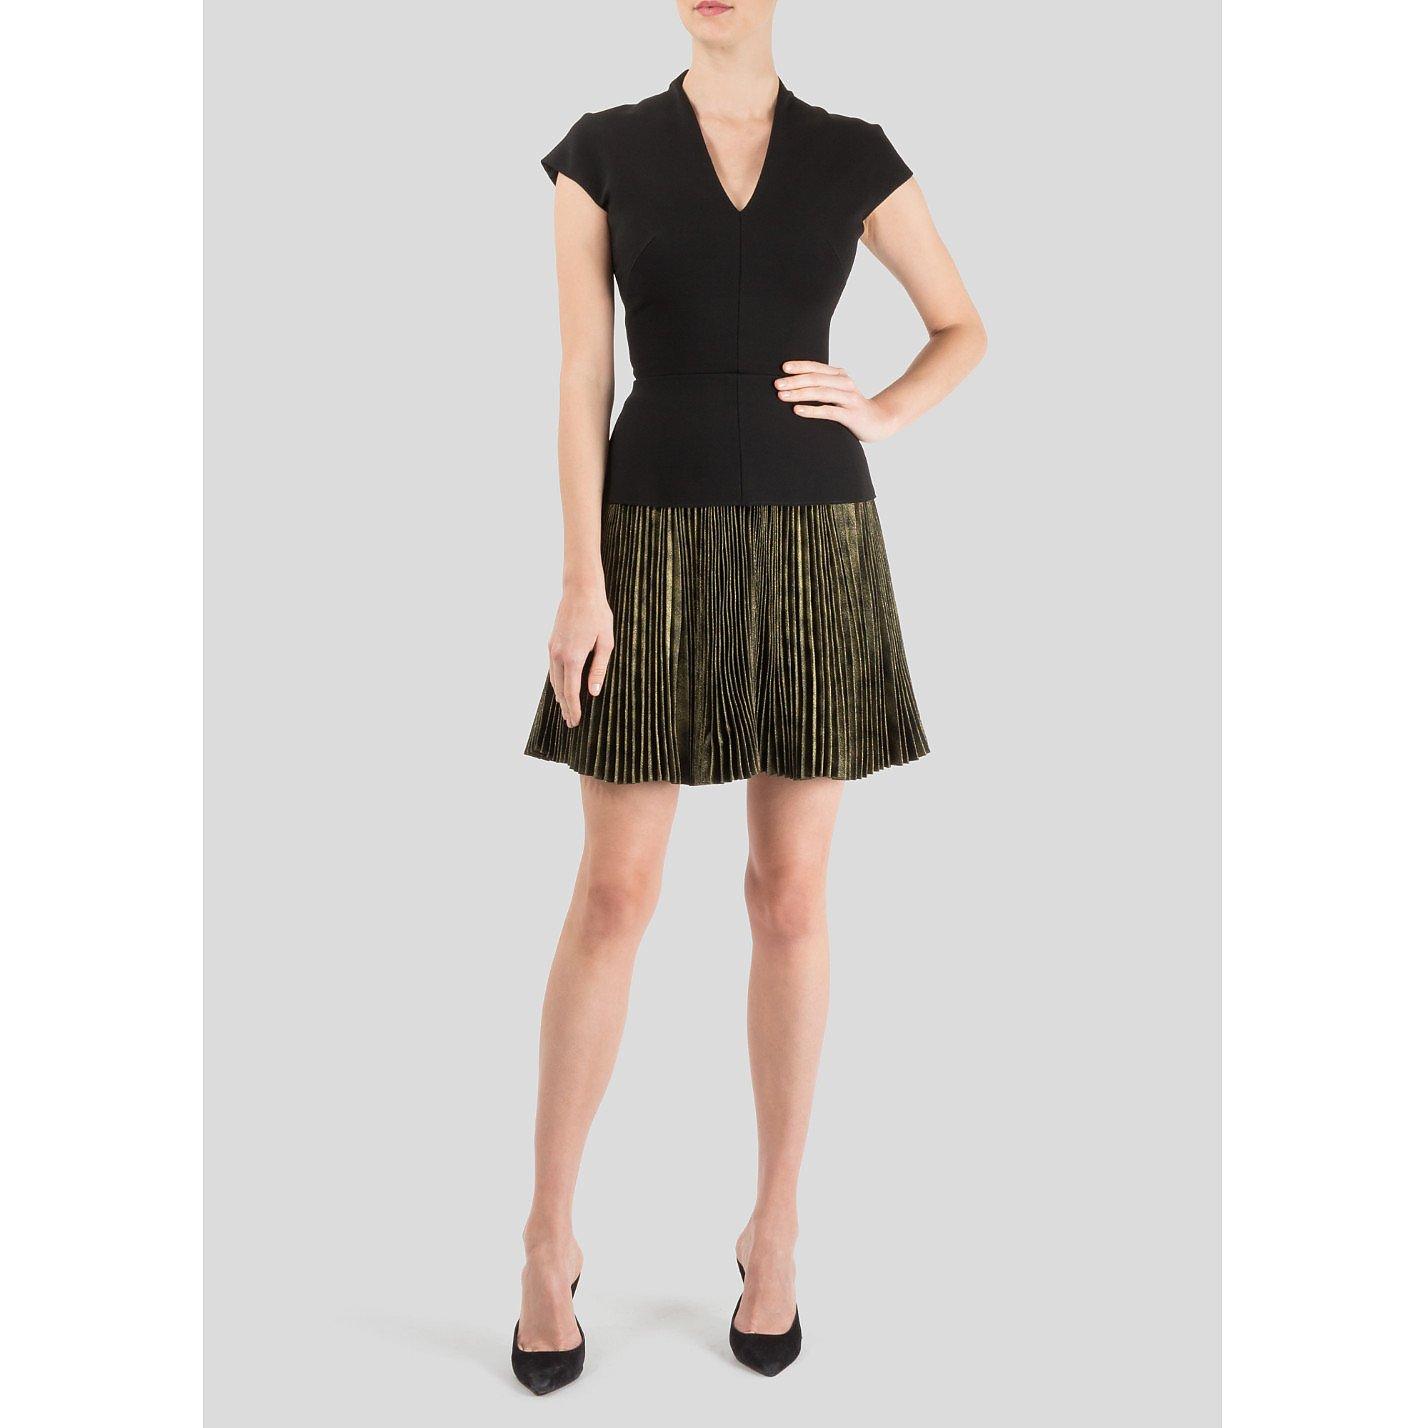 Victoria Beckham Pleated Metallic Skirt Dress